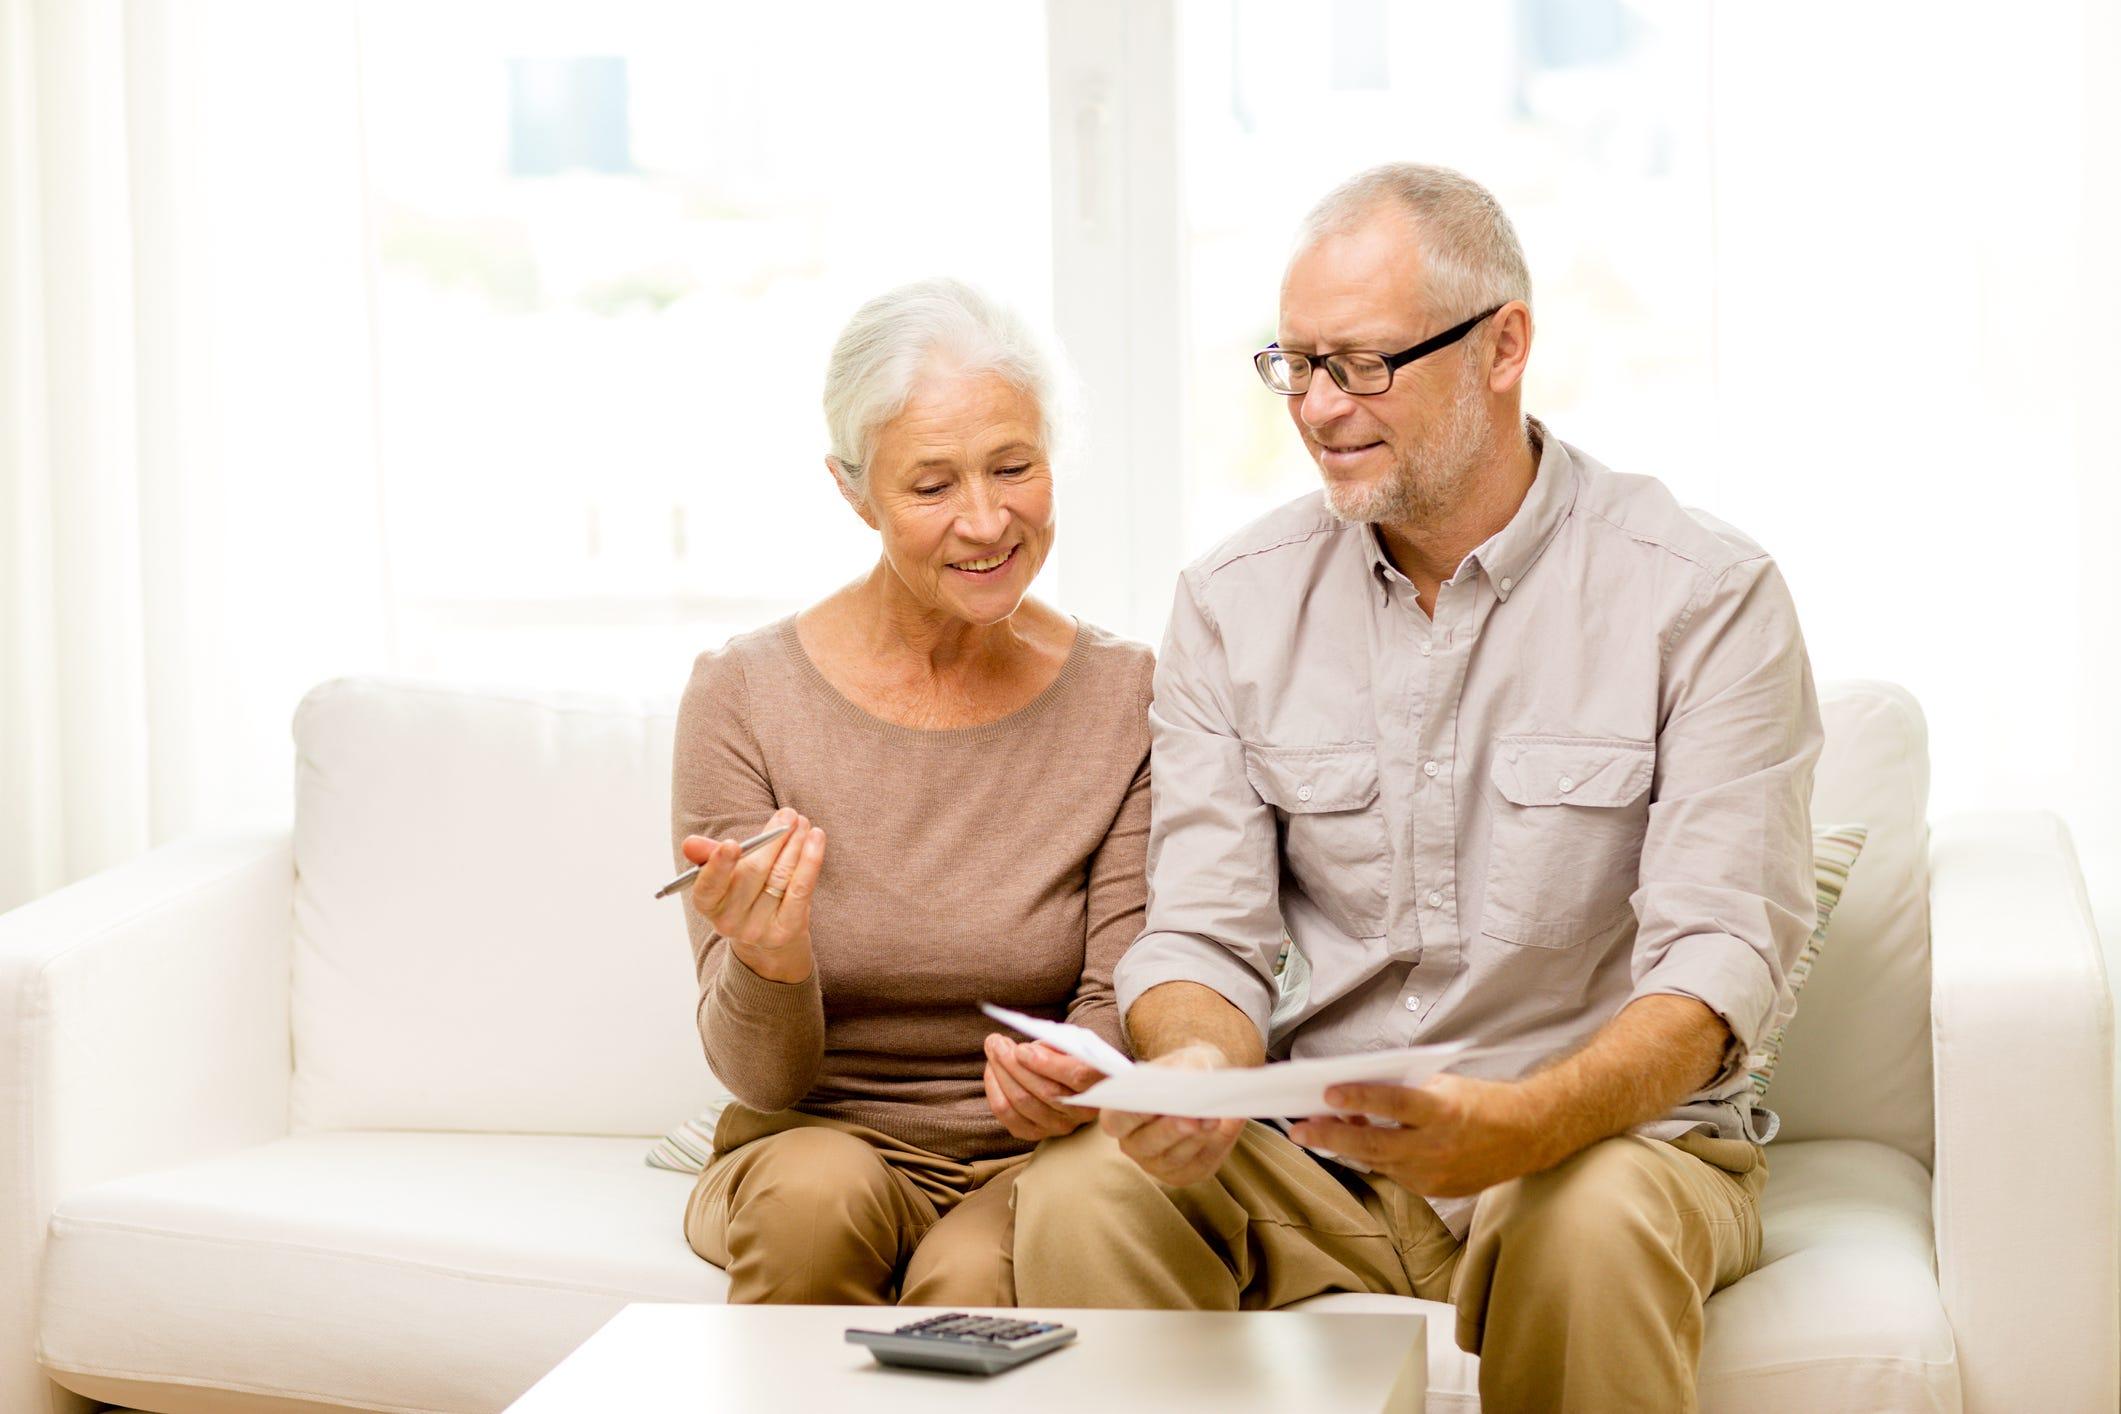 Short-term frugality till full retirement is risky, but doable